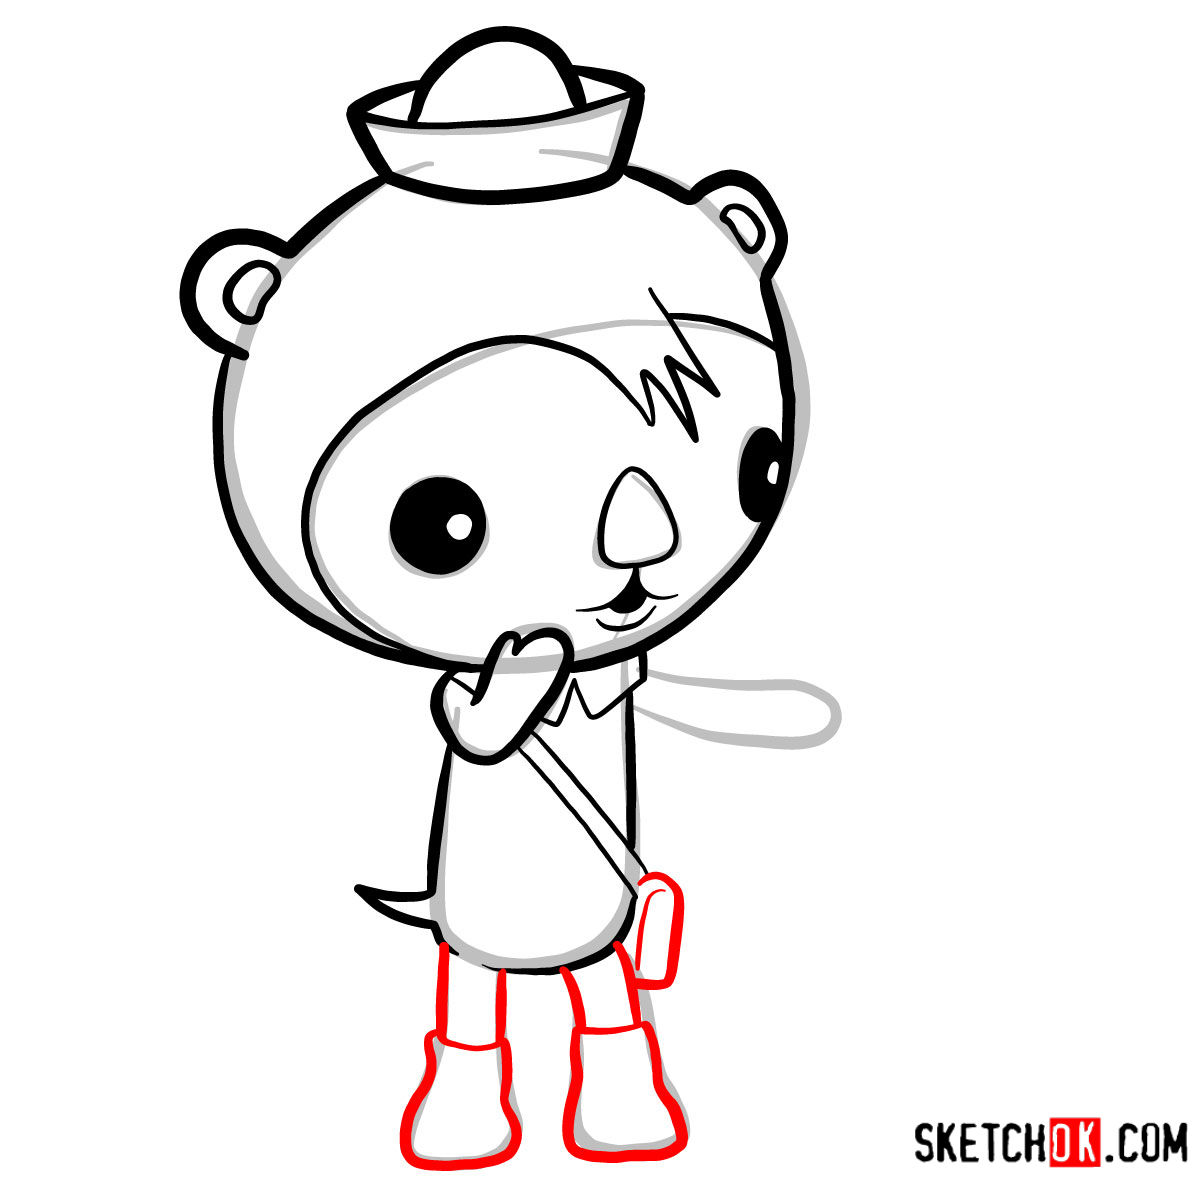 How to draw Shellington Sea Otter | Octonauts -  step 06